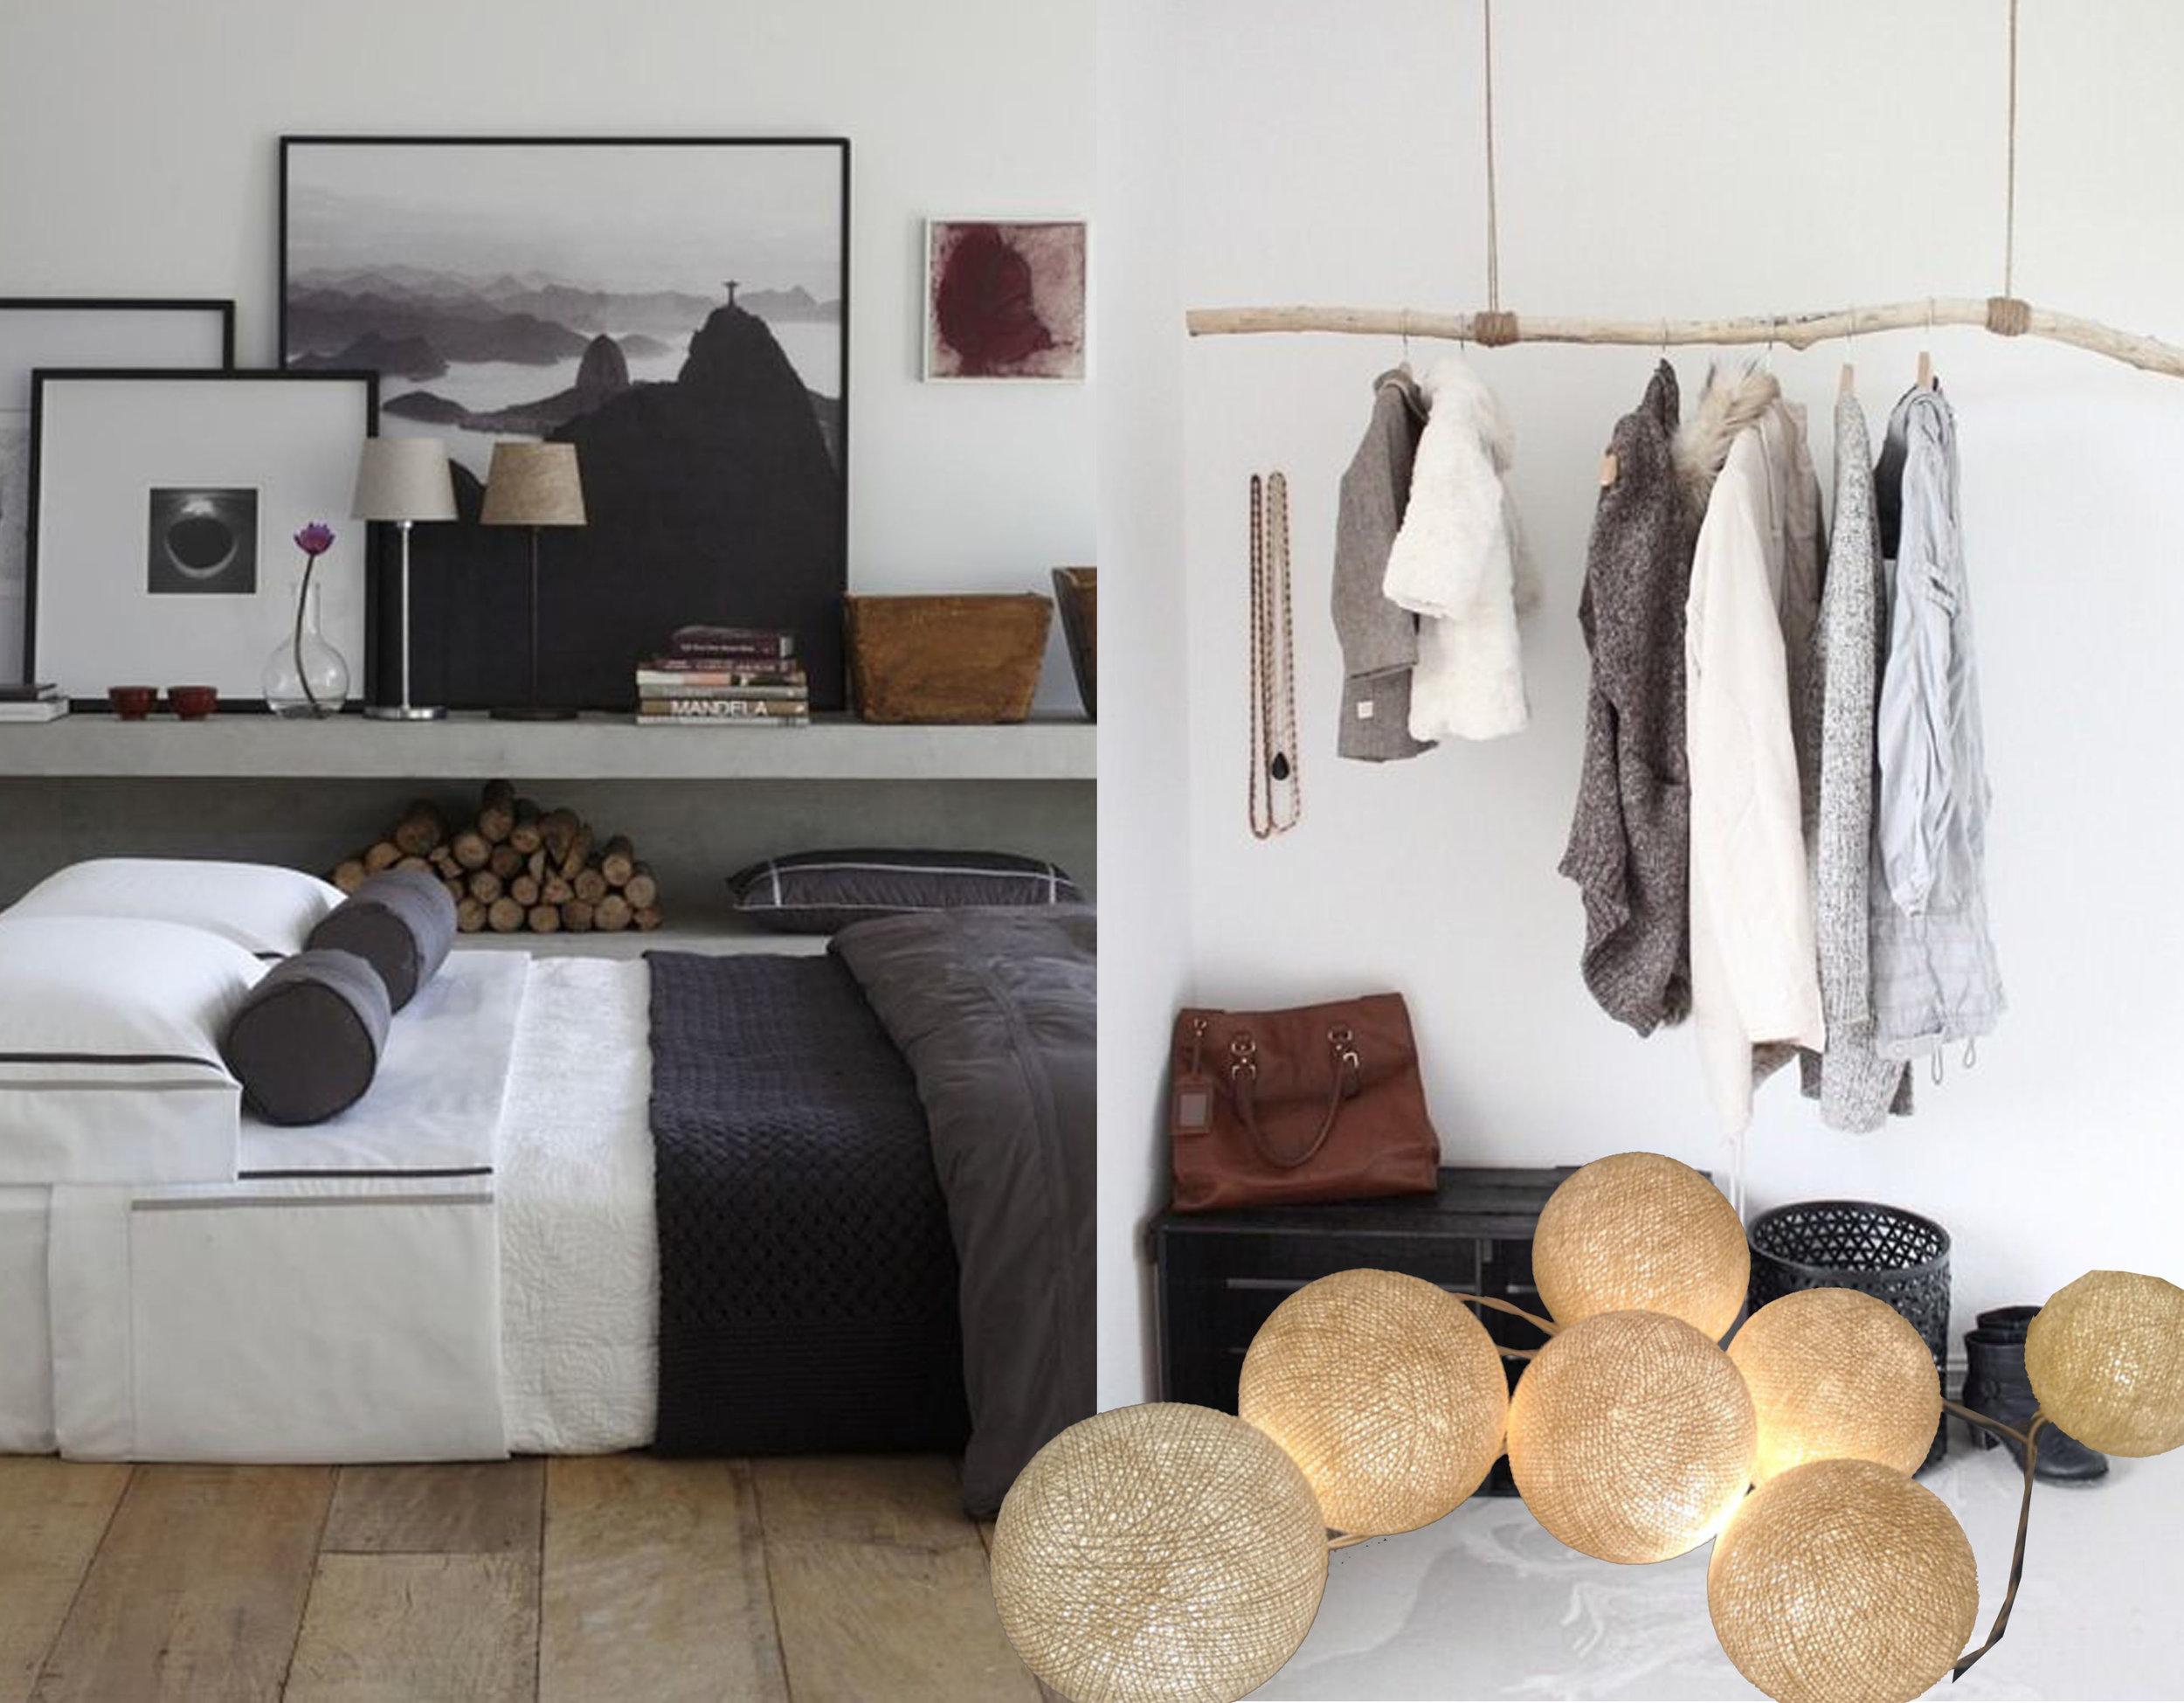 bedroom via  Frog Hills Design - cloth rack via  DIY to Try  - cotton ball string lights  Ginew